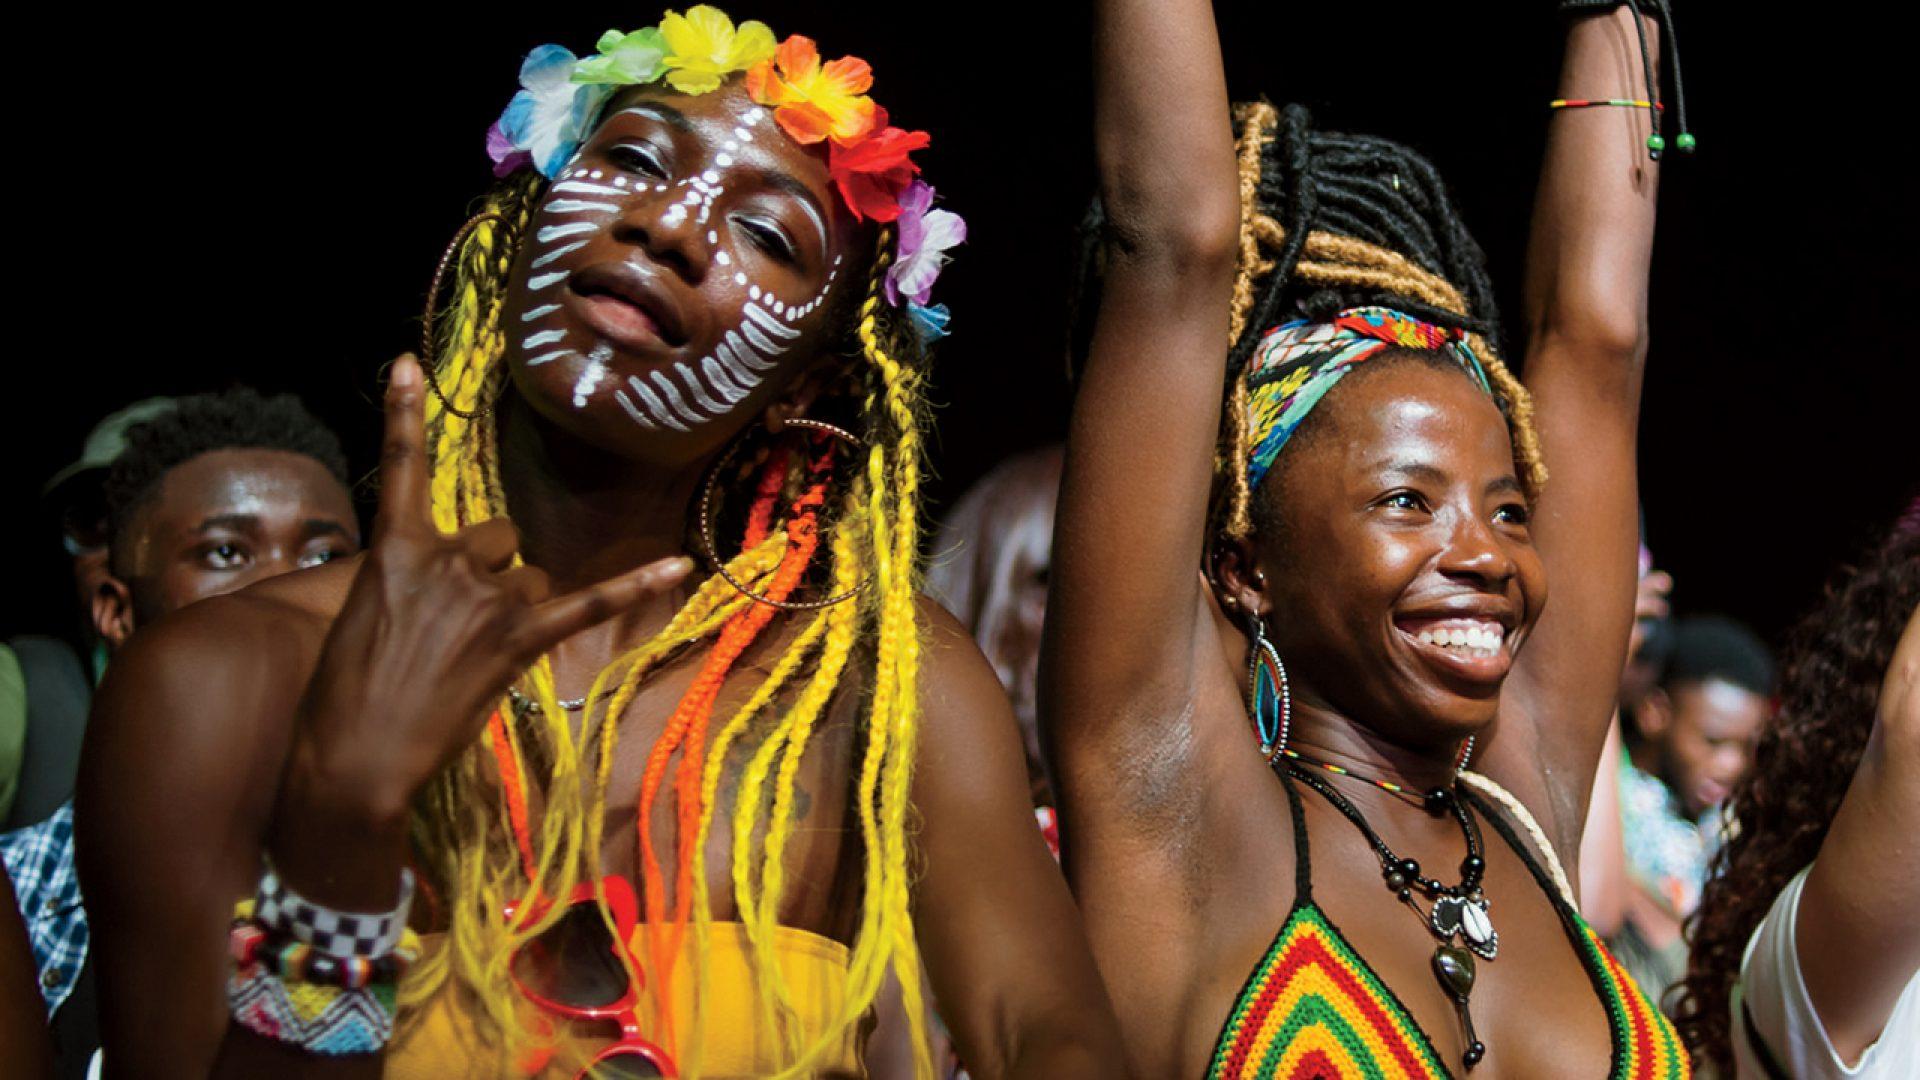 Karim Abdullah, Year of the Return, Ghana, Ghana Tourism, KOLUMN Magazine, KOLUMN, KINDR'D Magazine, KINDR'D, Willoughby Avenue, Wriit, Afrochella,